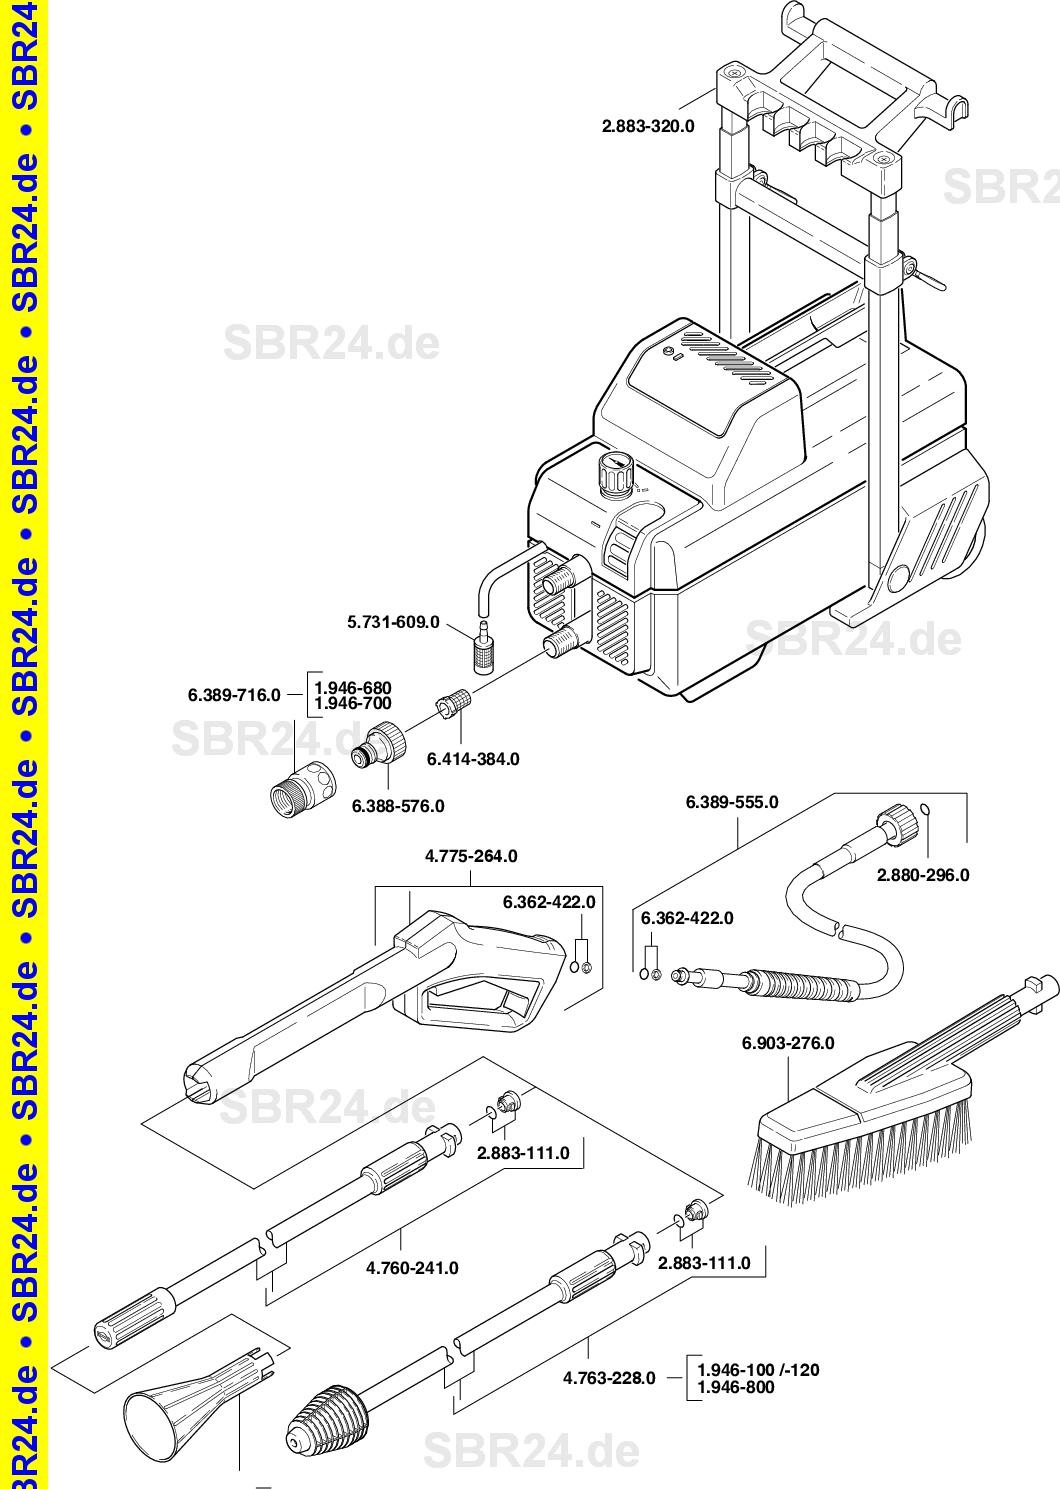 Kärcher Ersatzteile Kärcher 580 M 1946 1000